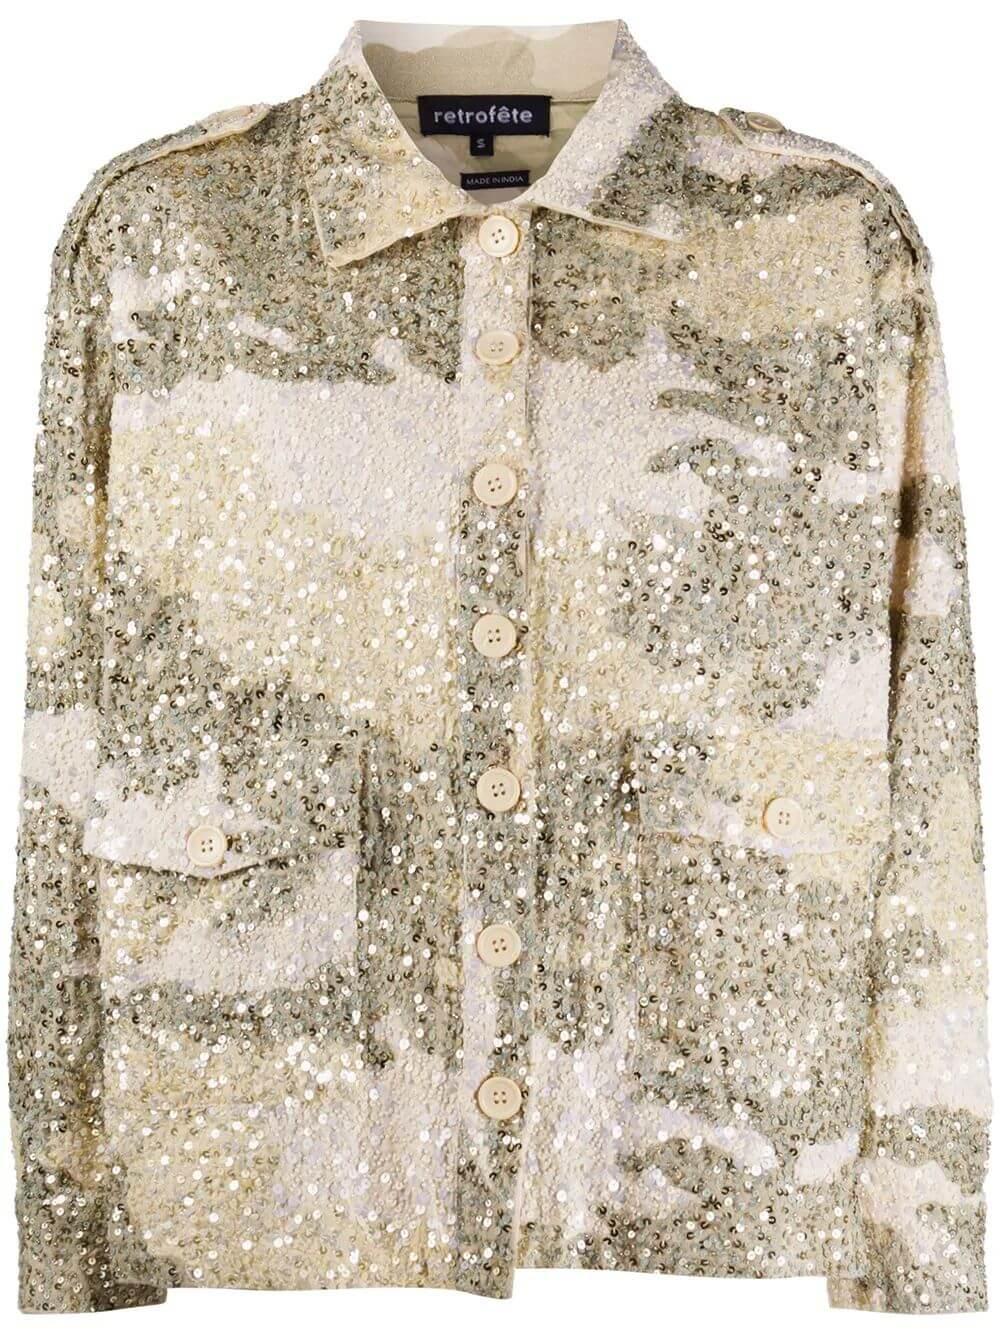 Idan Sequin Camo Jacket Item # PF20-2582